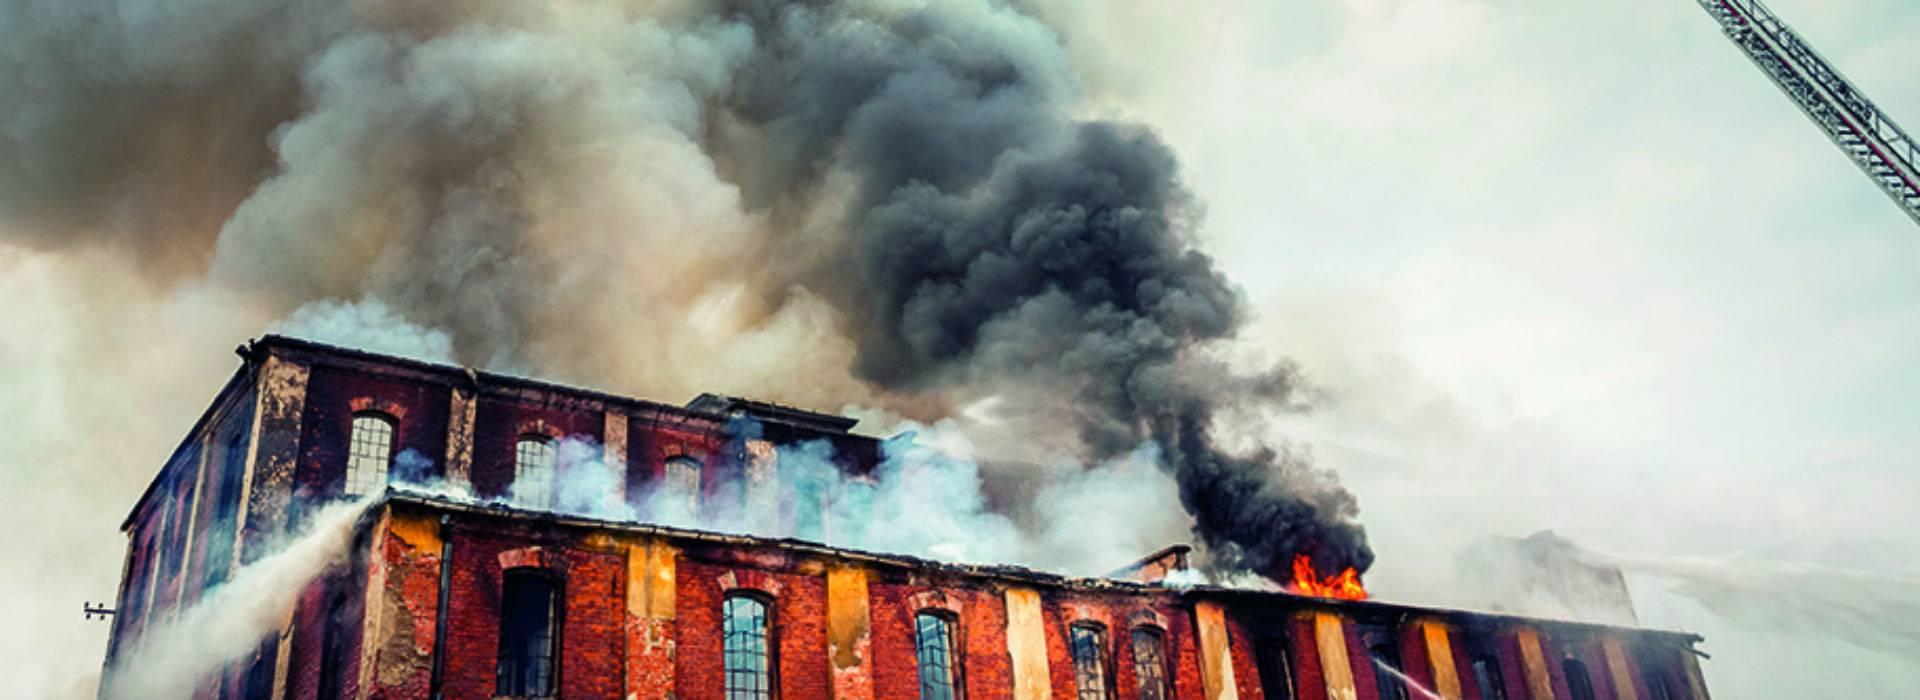 Reduce Fire Risk blog post